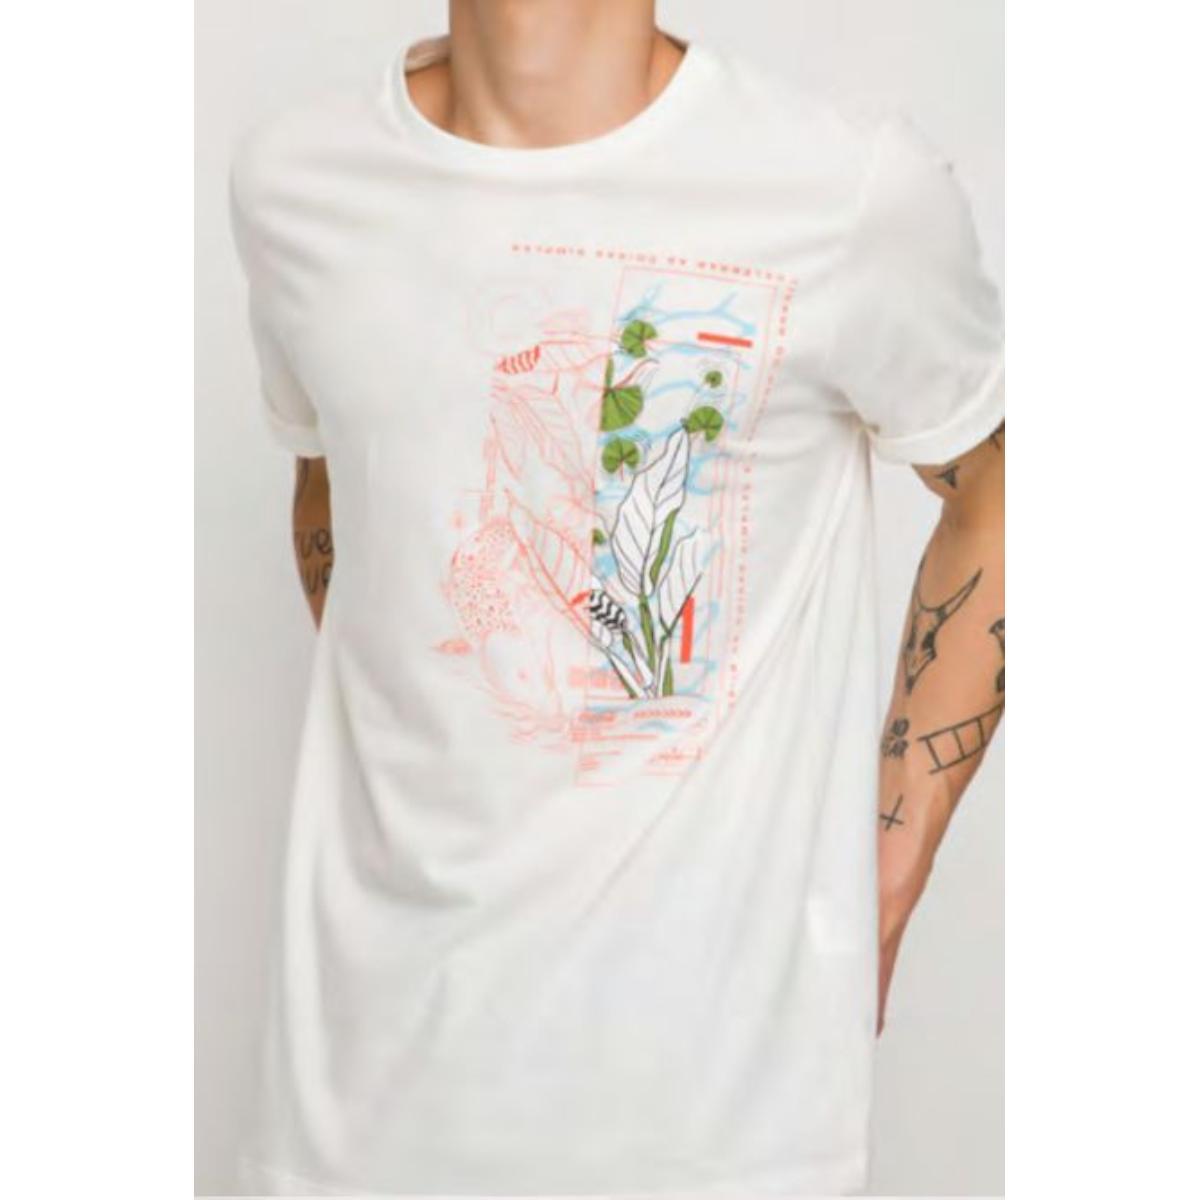 Camiseta Masculina Coca-cola Clothing 353207464 58529 Off White